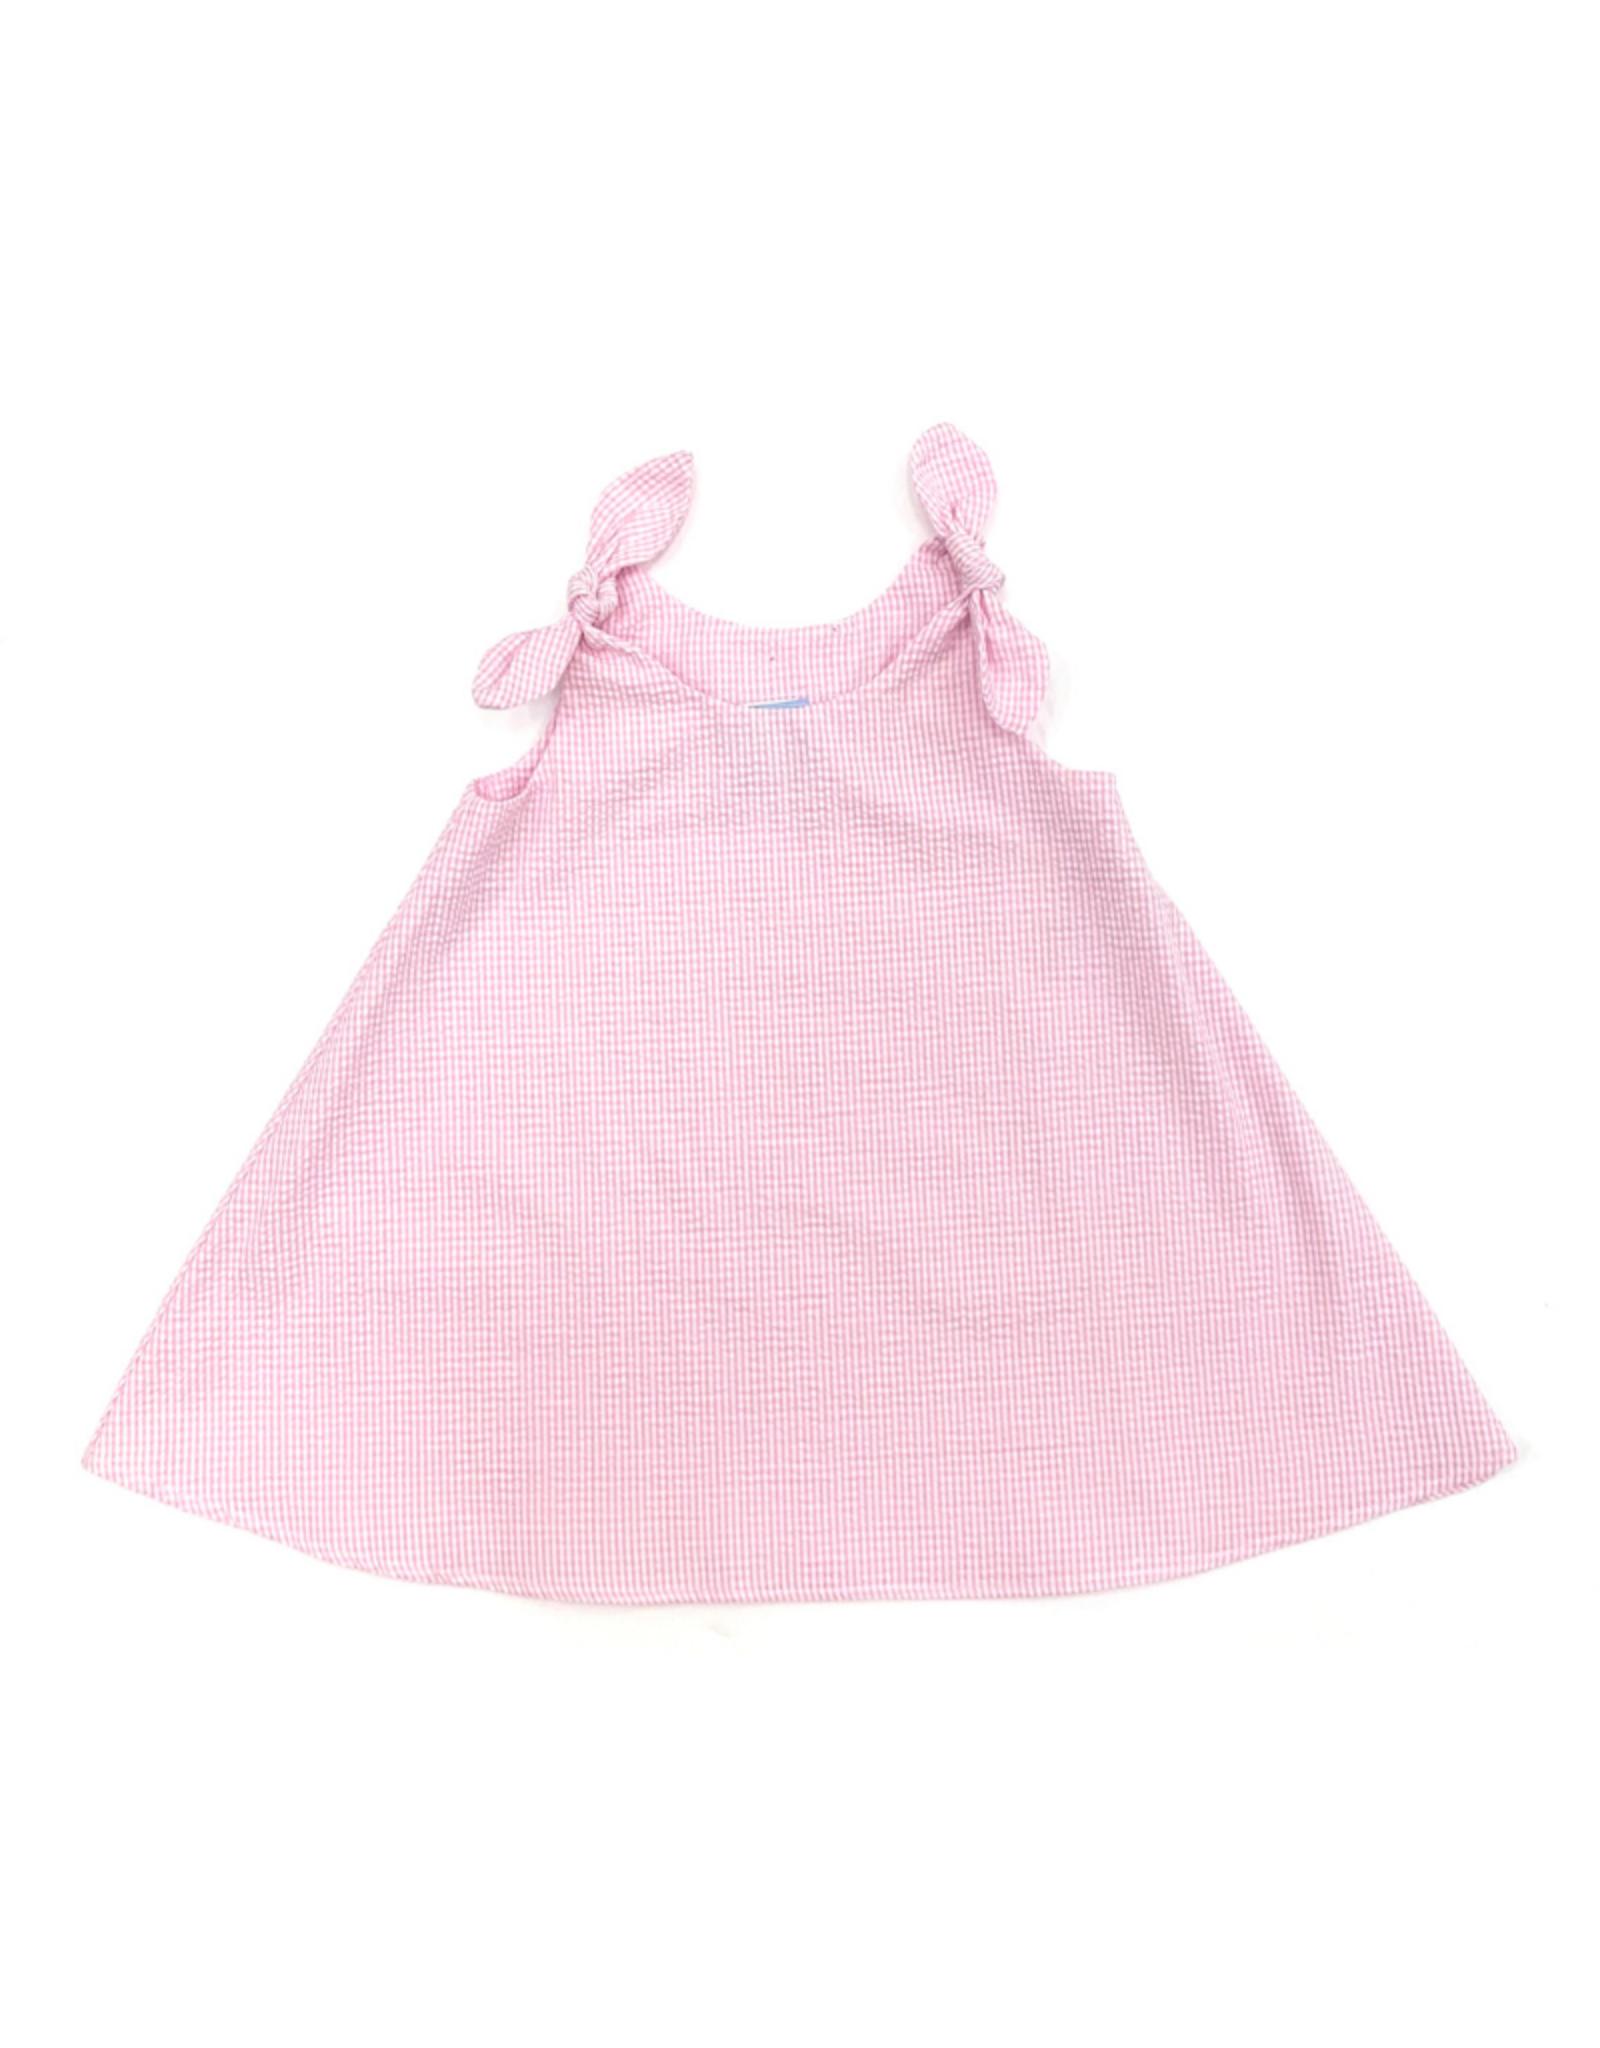 Funtasia Too Pink Swing Dress Tie Shoulder